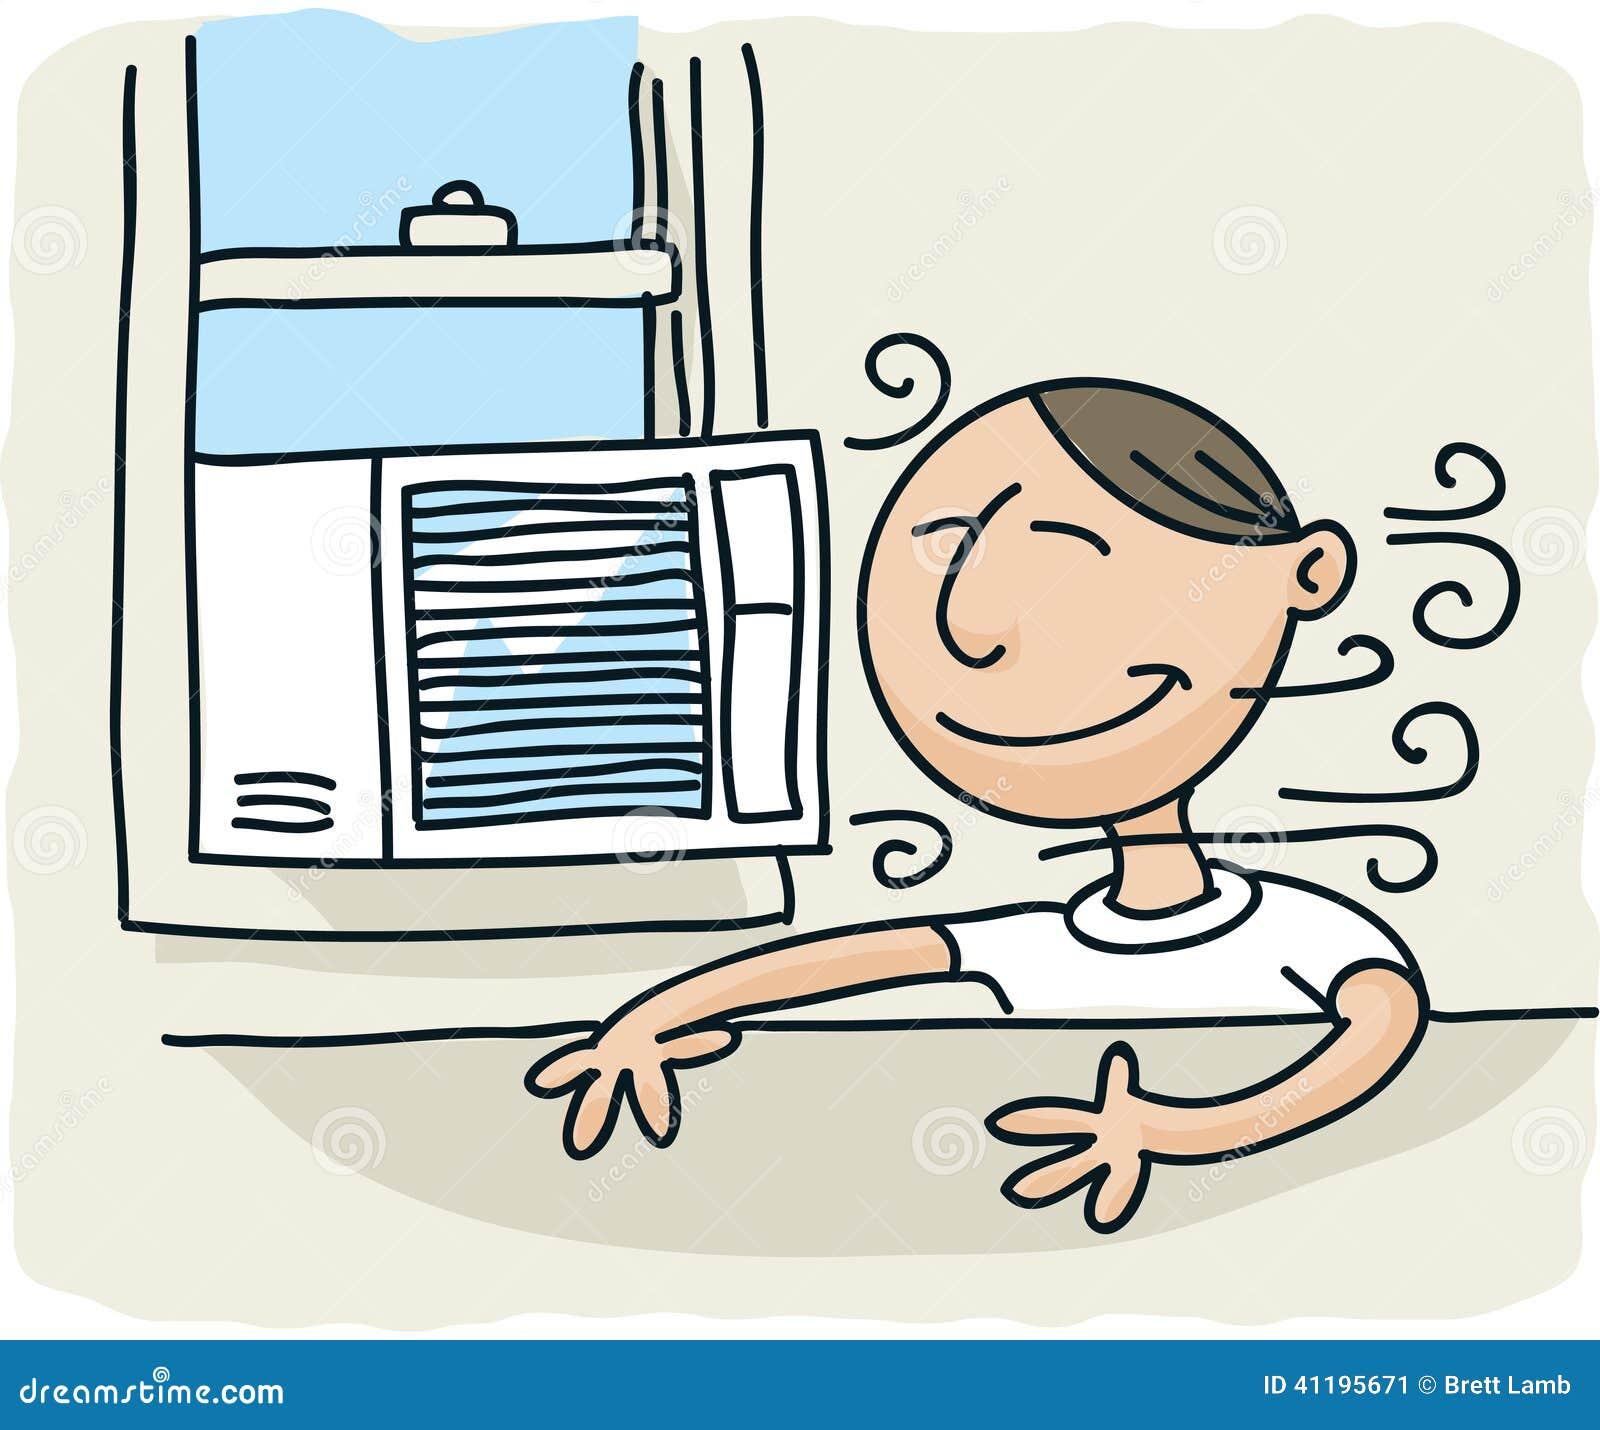 Room Air Conditioner Prices